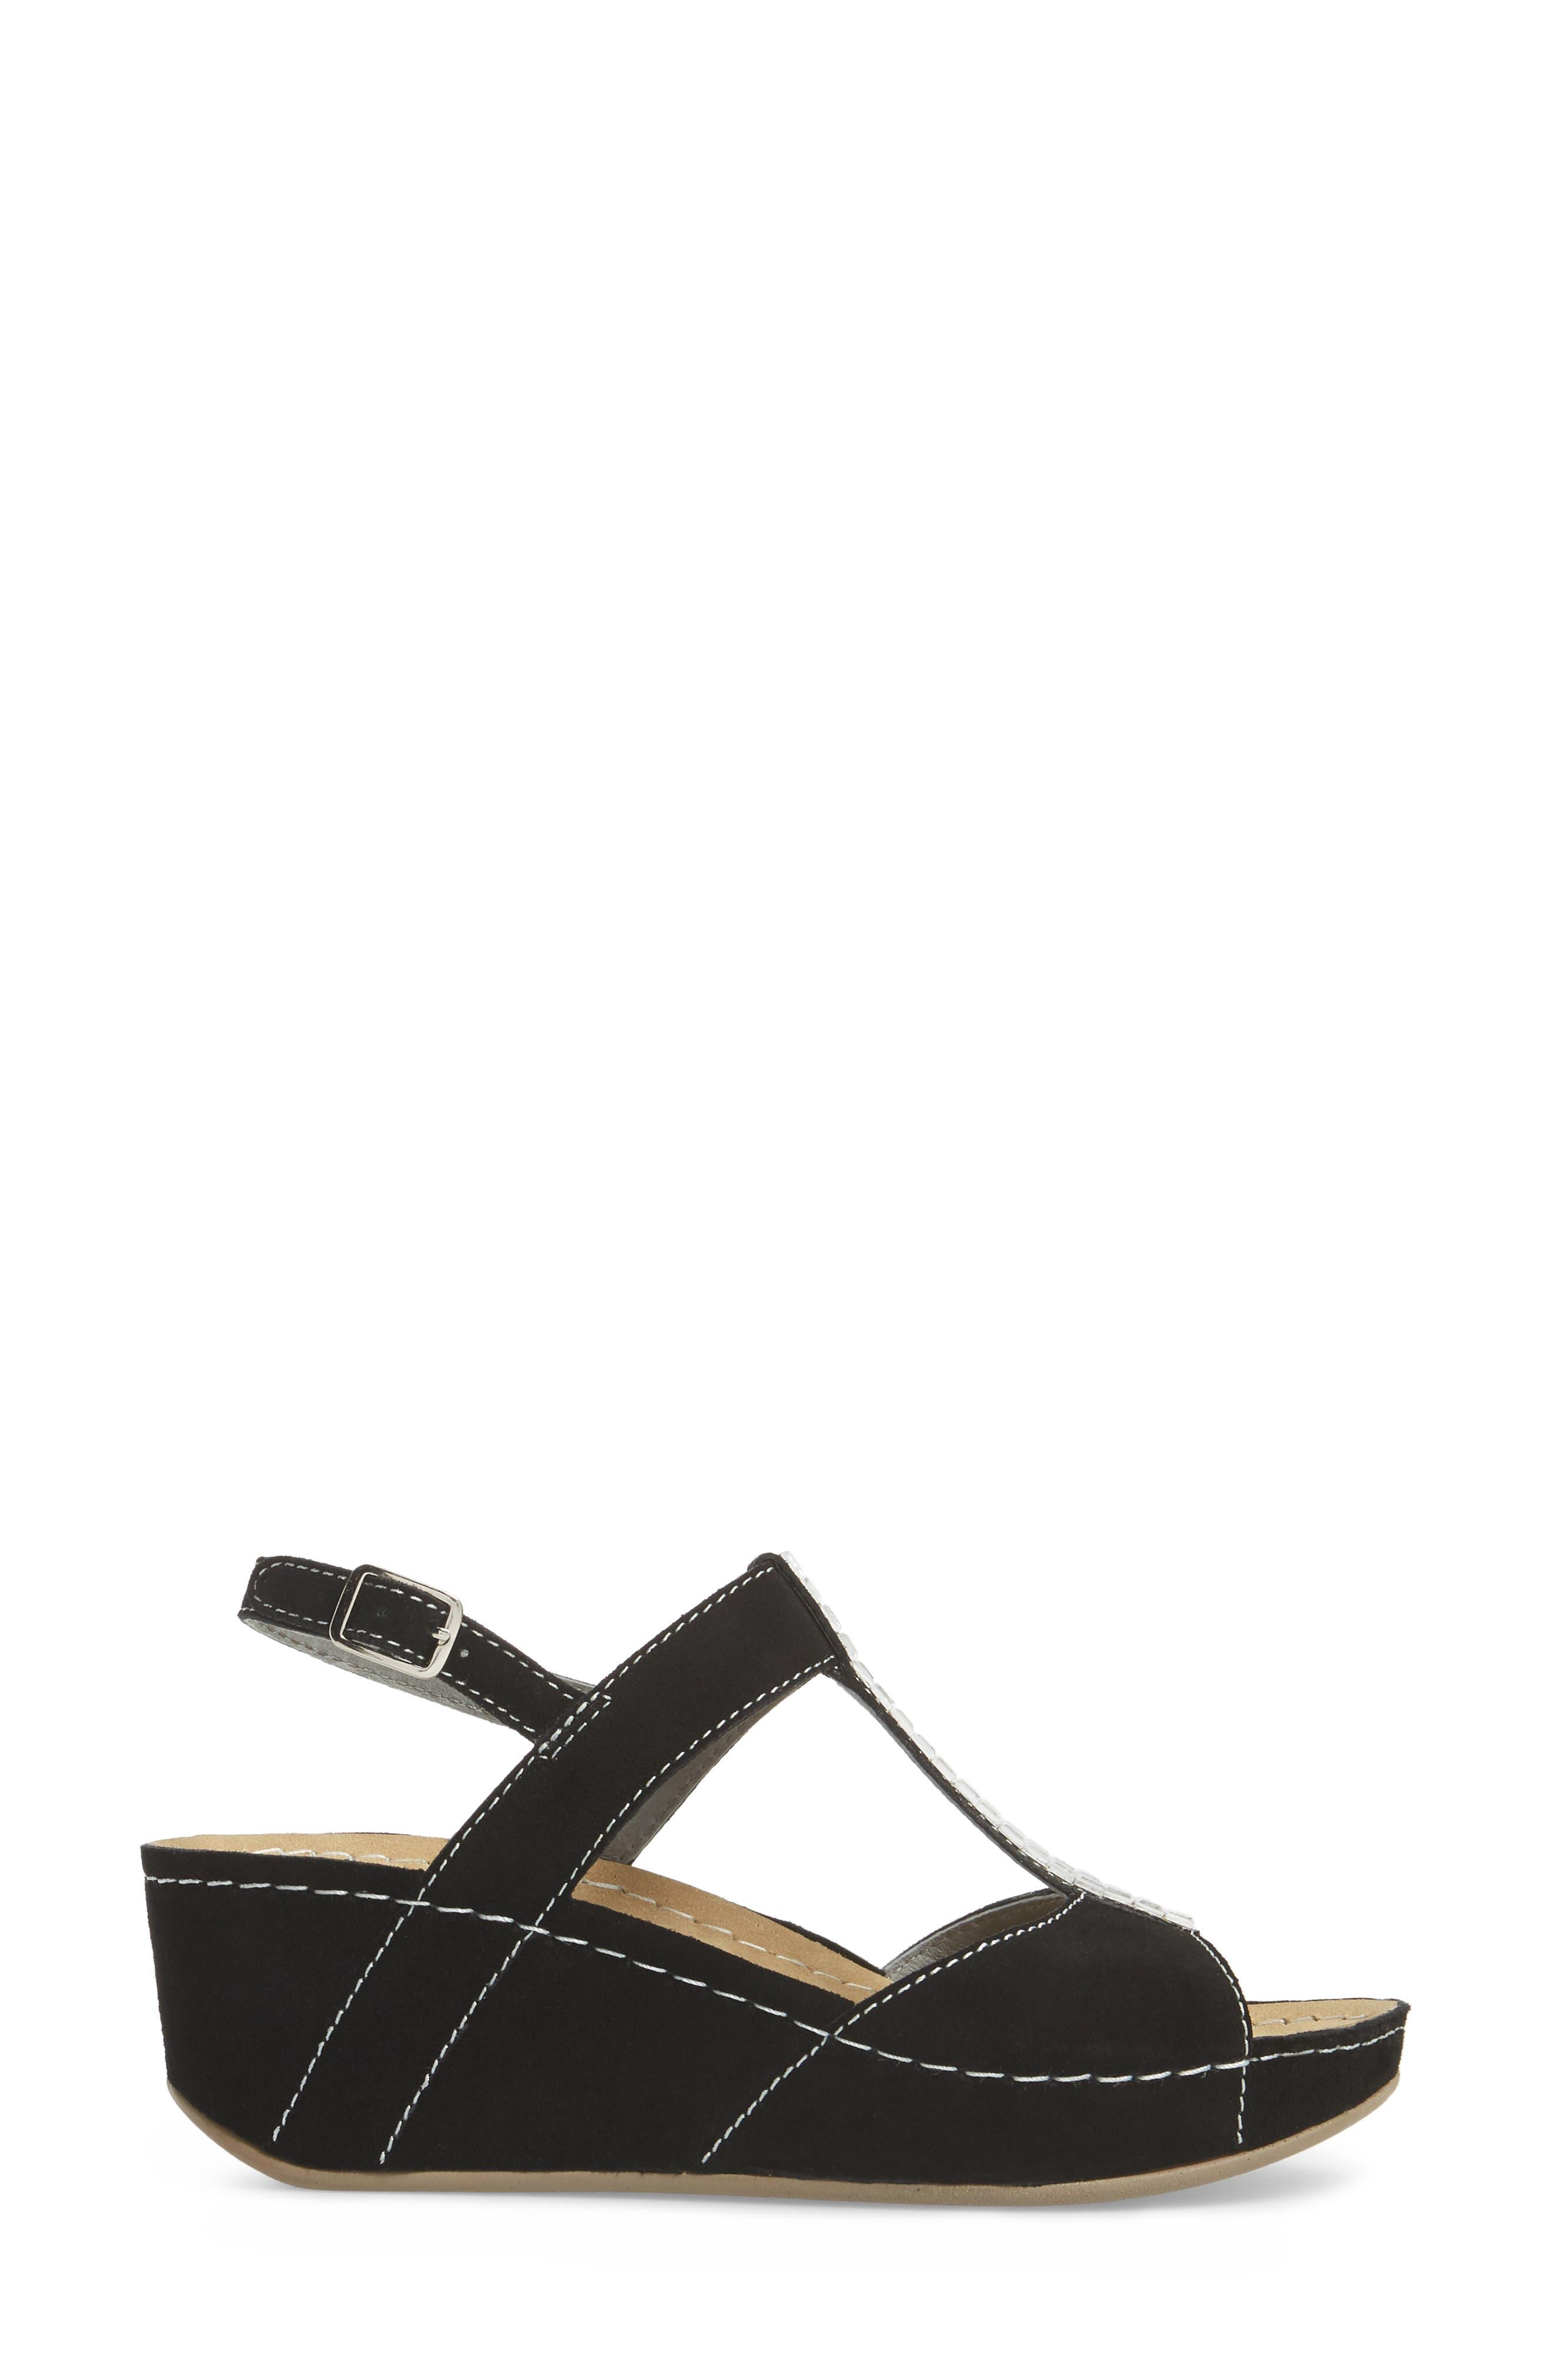 Bubbly Embellished T-Strap Wedge Sandal,                             Alternate thumbnail 3, color,                             BLACK SUEDE